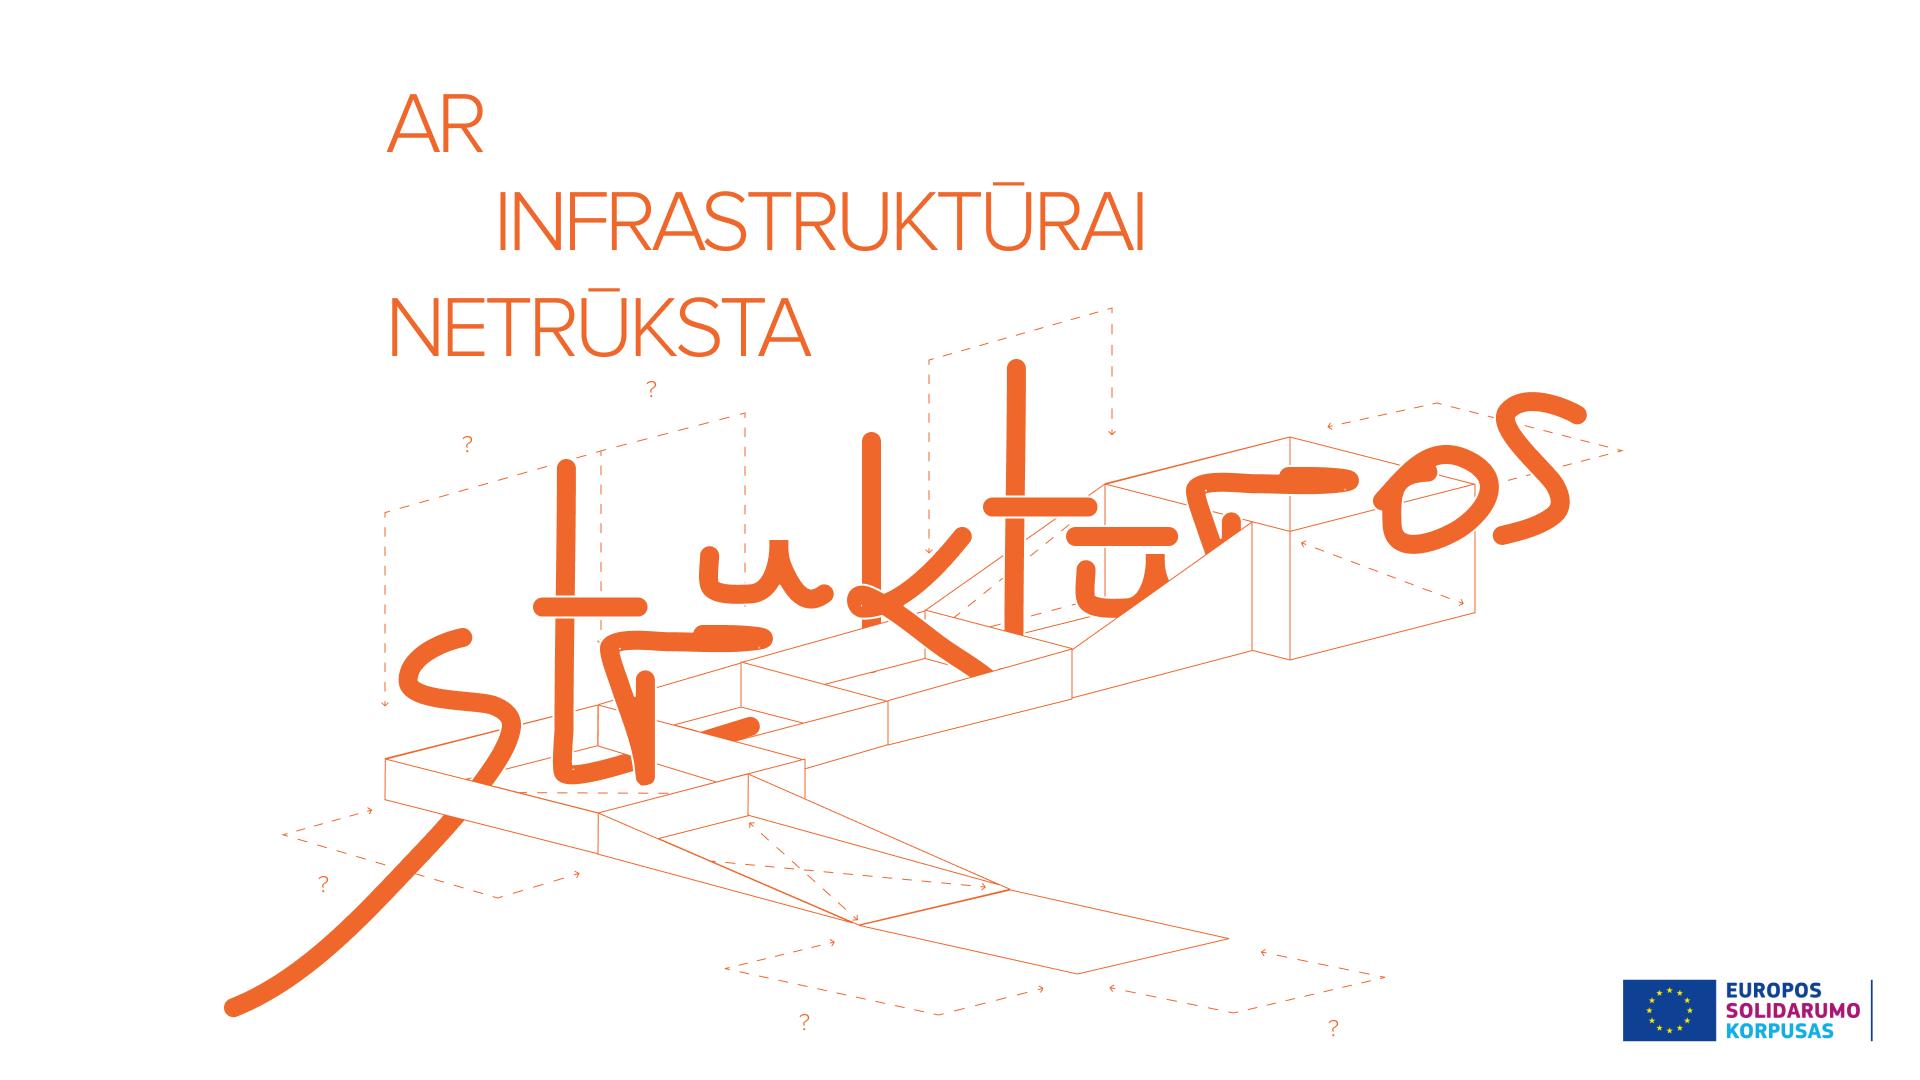 Jaunimas klausia: ar infrastruktūrai netrūksta struktūros?